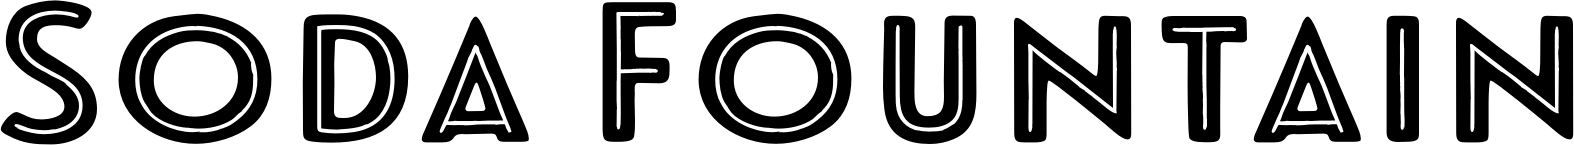 Le Havre Rough Centerline Reversed Font by Insigne : Font Bros